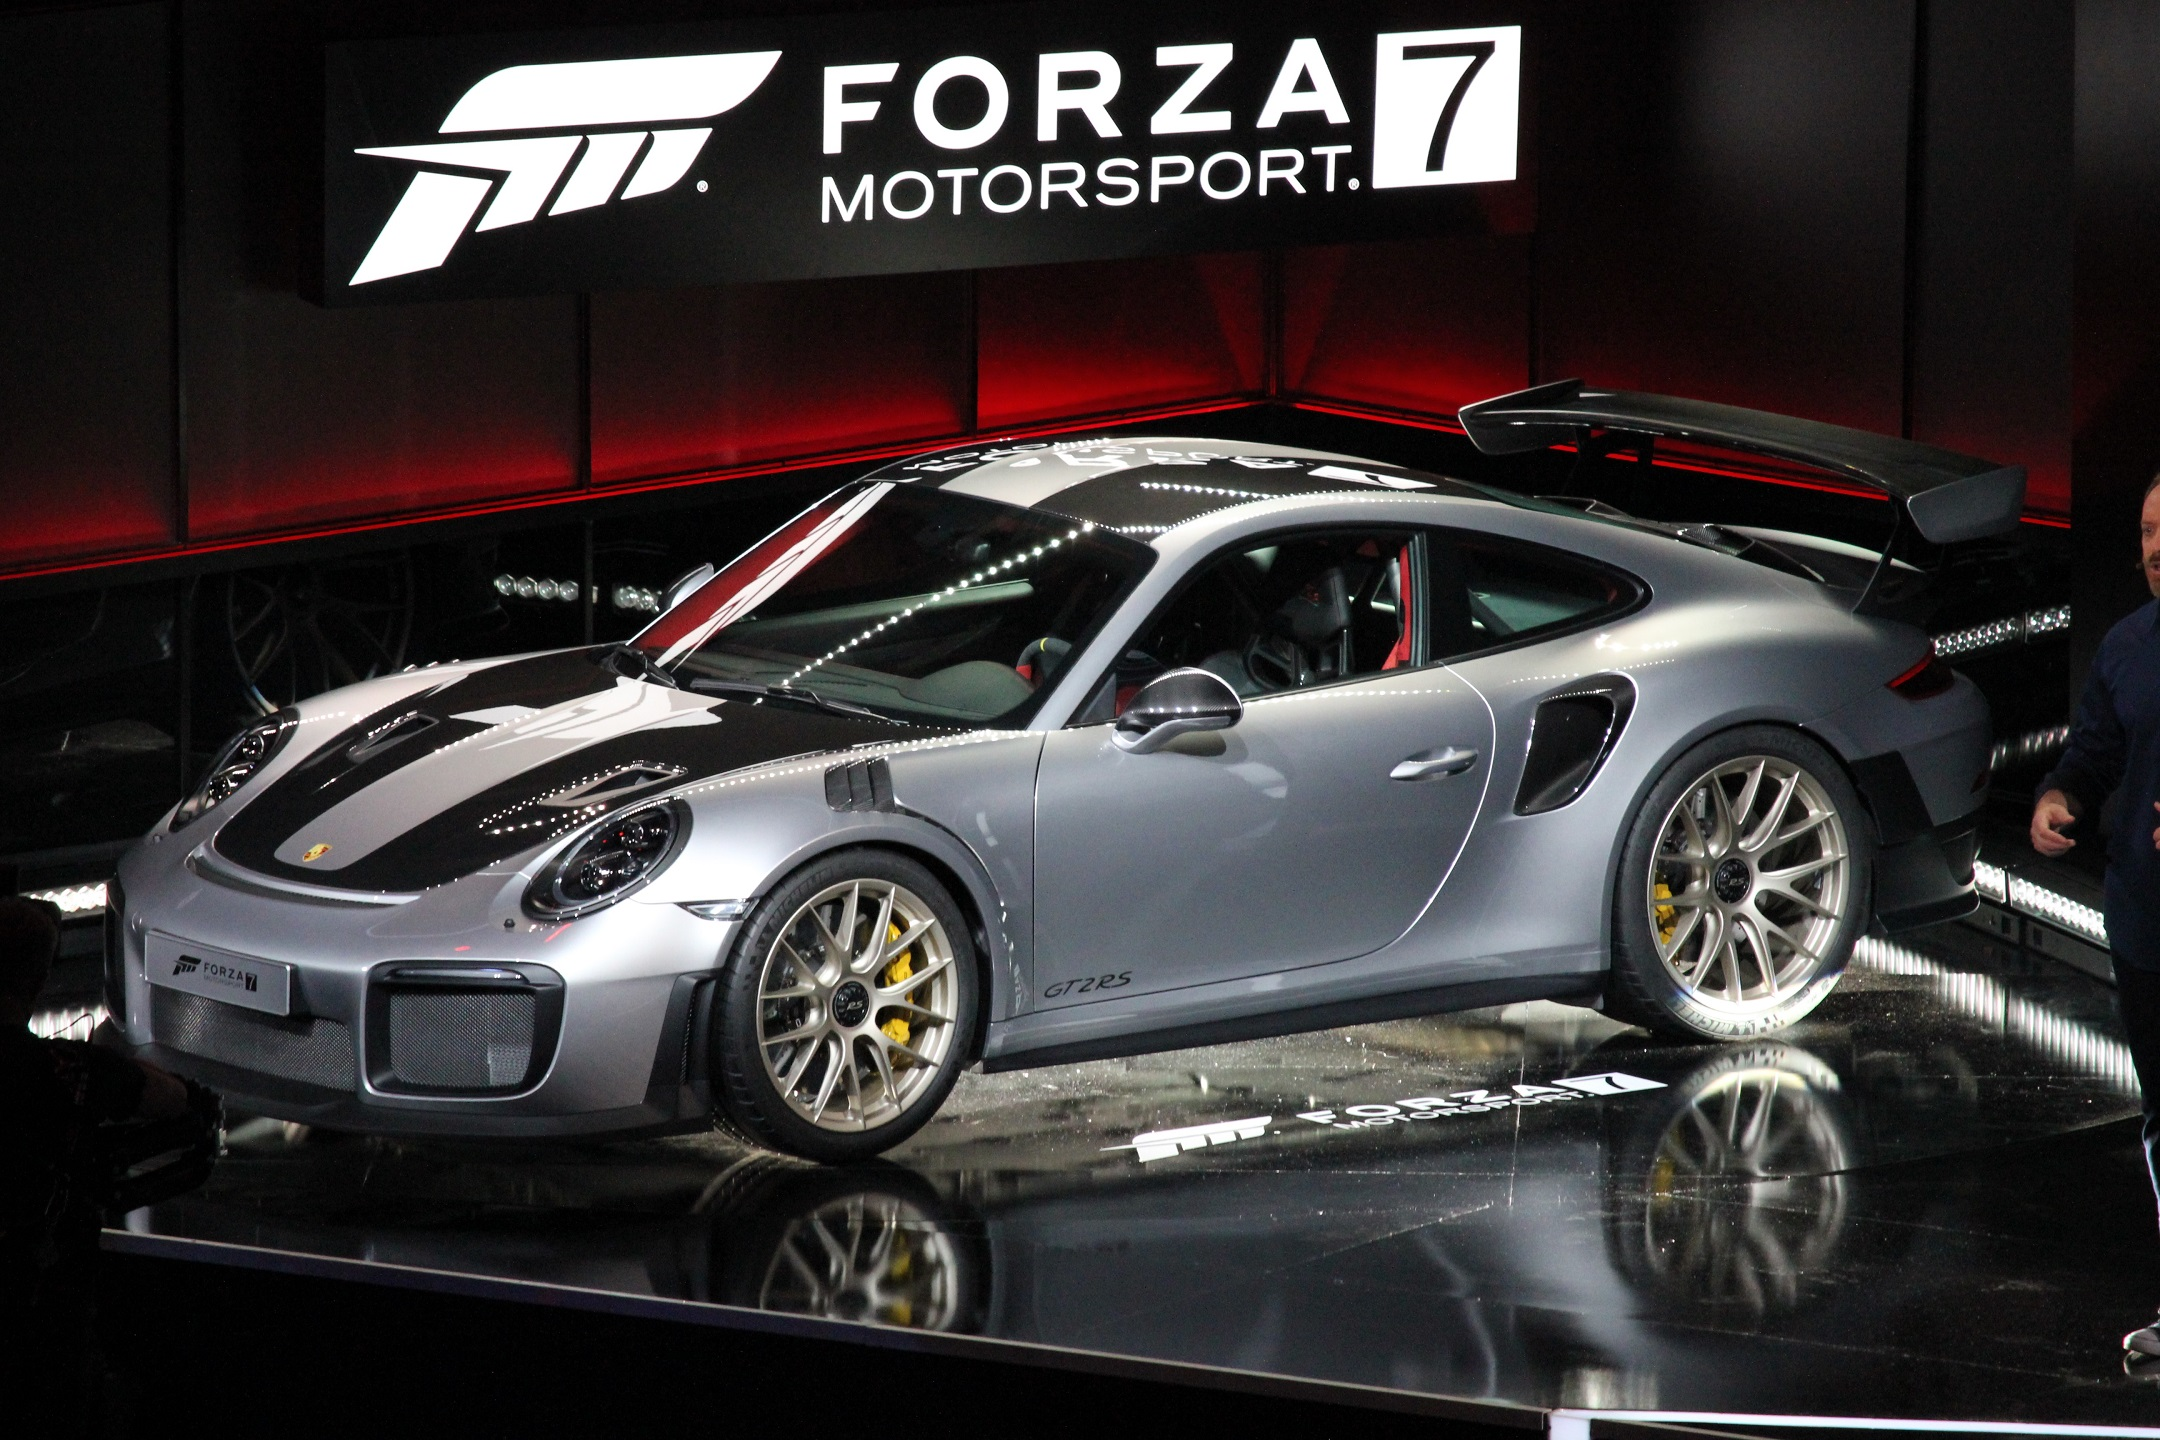 Porsche 991 GT2 RS confirmed as Forza Motorsport 7's cover car